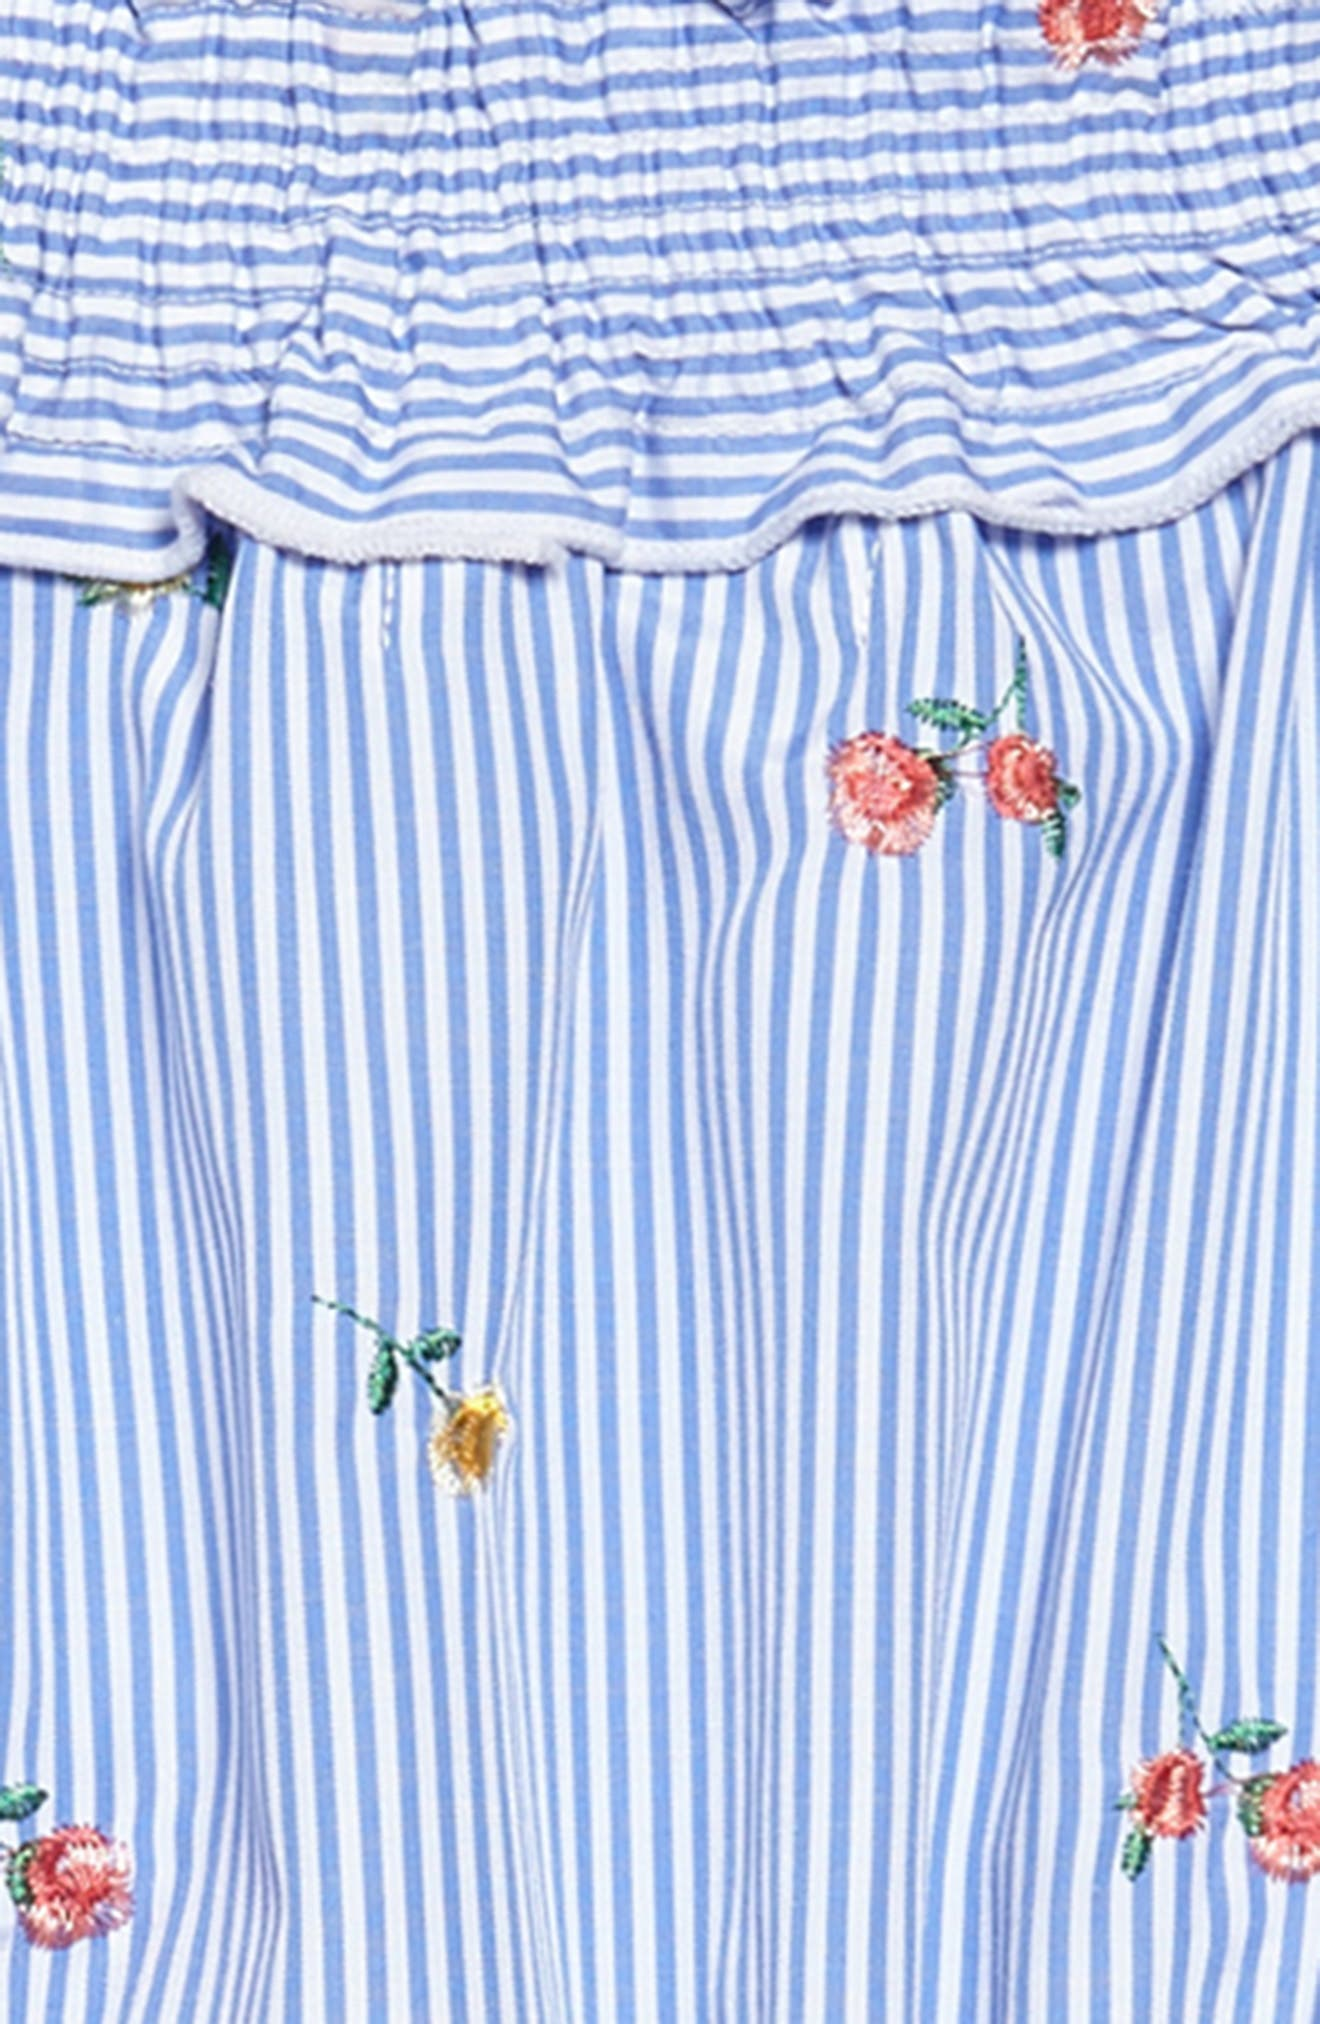 Floral Embroidery Stripe Off the Shoulder Dress,                             Alternate thumbnail 3, color,                             Light Blue/ White